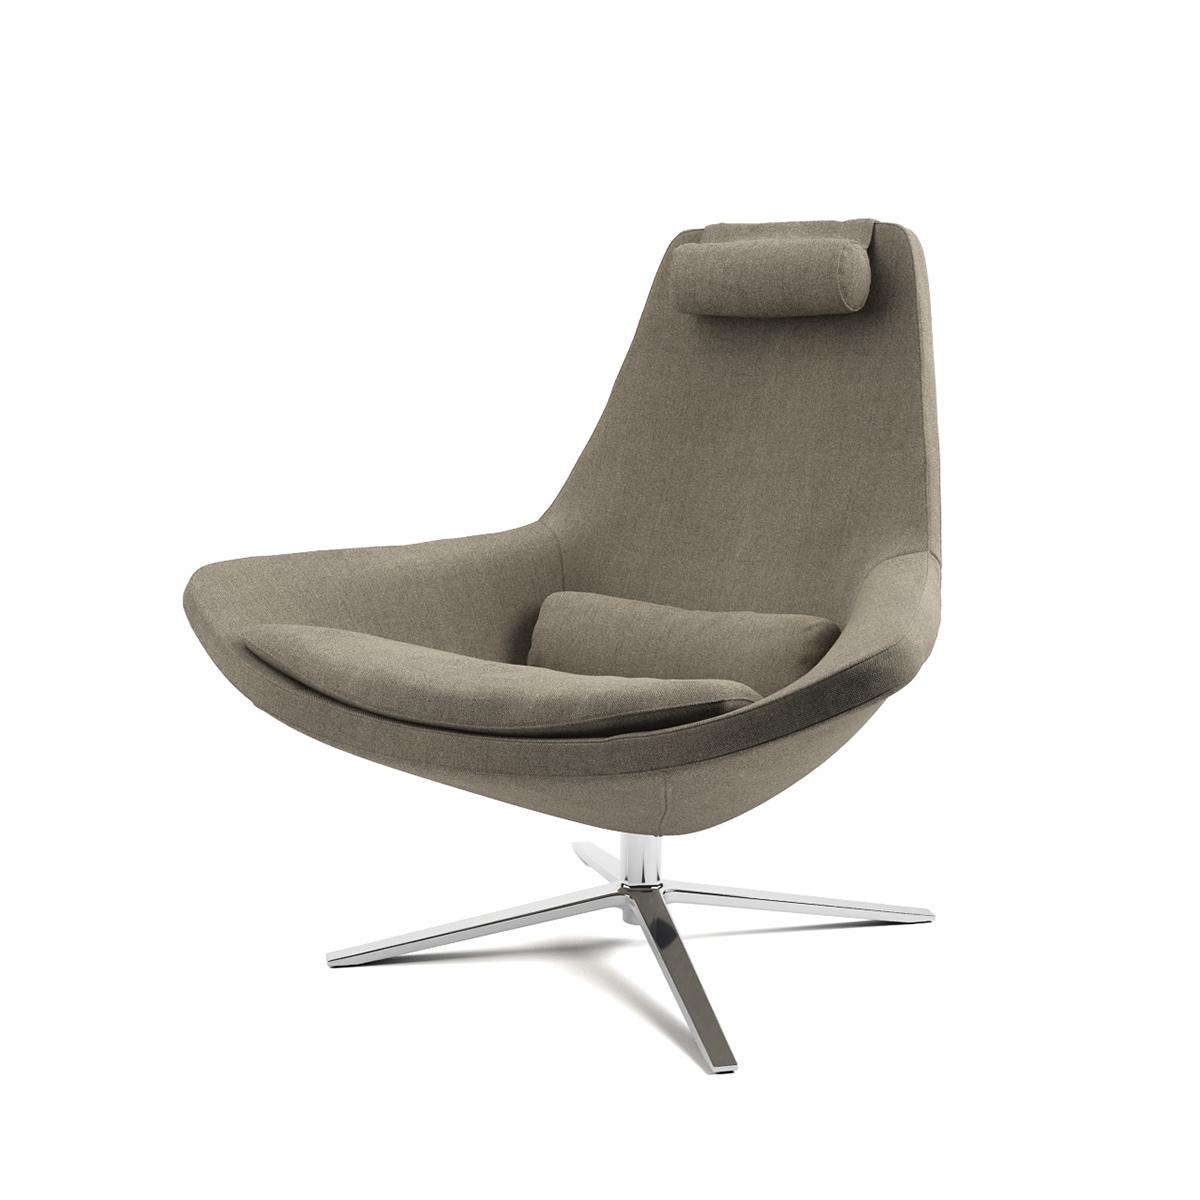 Free 3d Model: Metropolitan Armchair By Bu0026B Italia On Behance